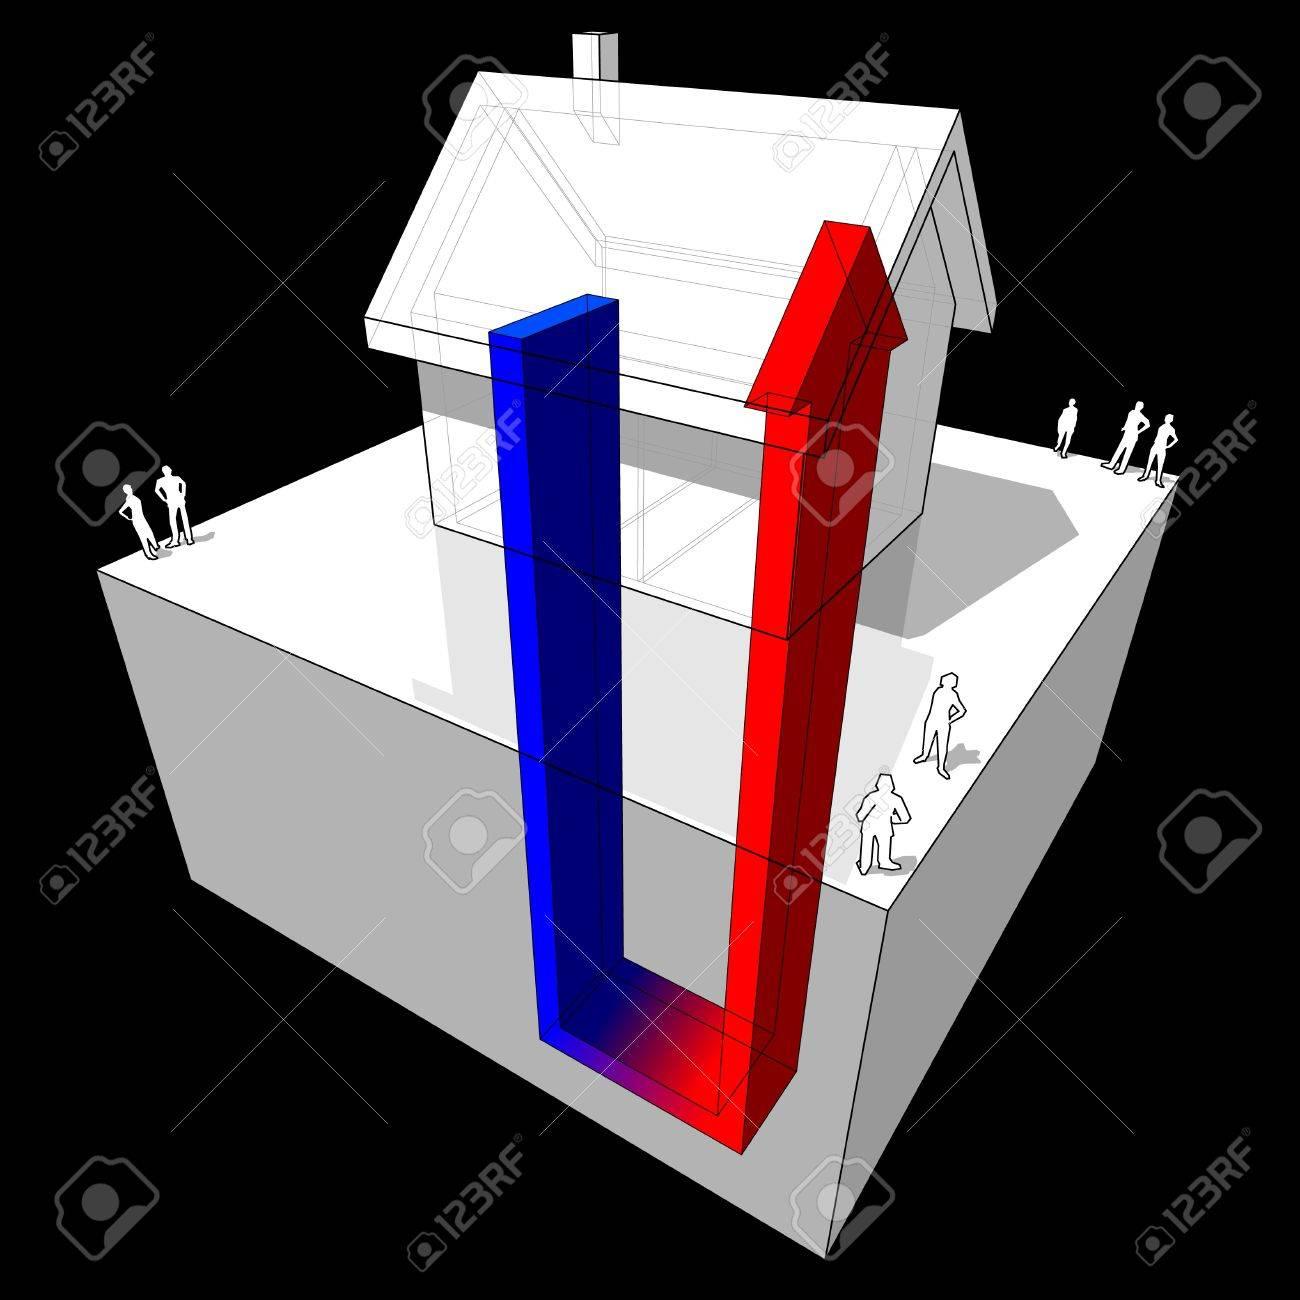 Geothermal Heat Pump Wiring Diagram Trusted Diagrams 3 Ton Illustration Schematics Trane Air Conditioner